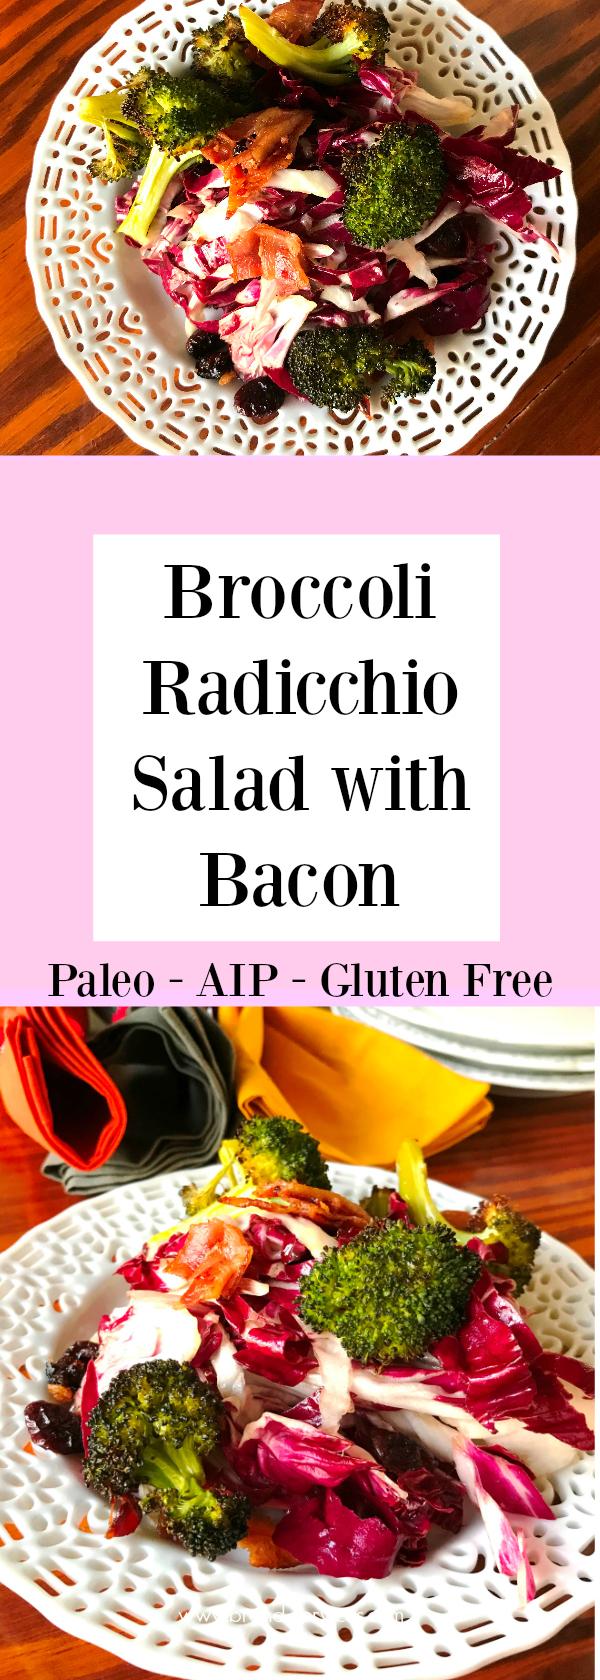 Broccoli Radicchio Salad with Bacon Paleo AIP Gluten Free